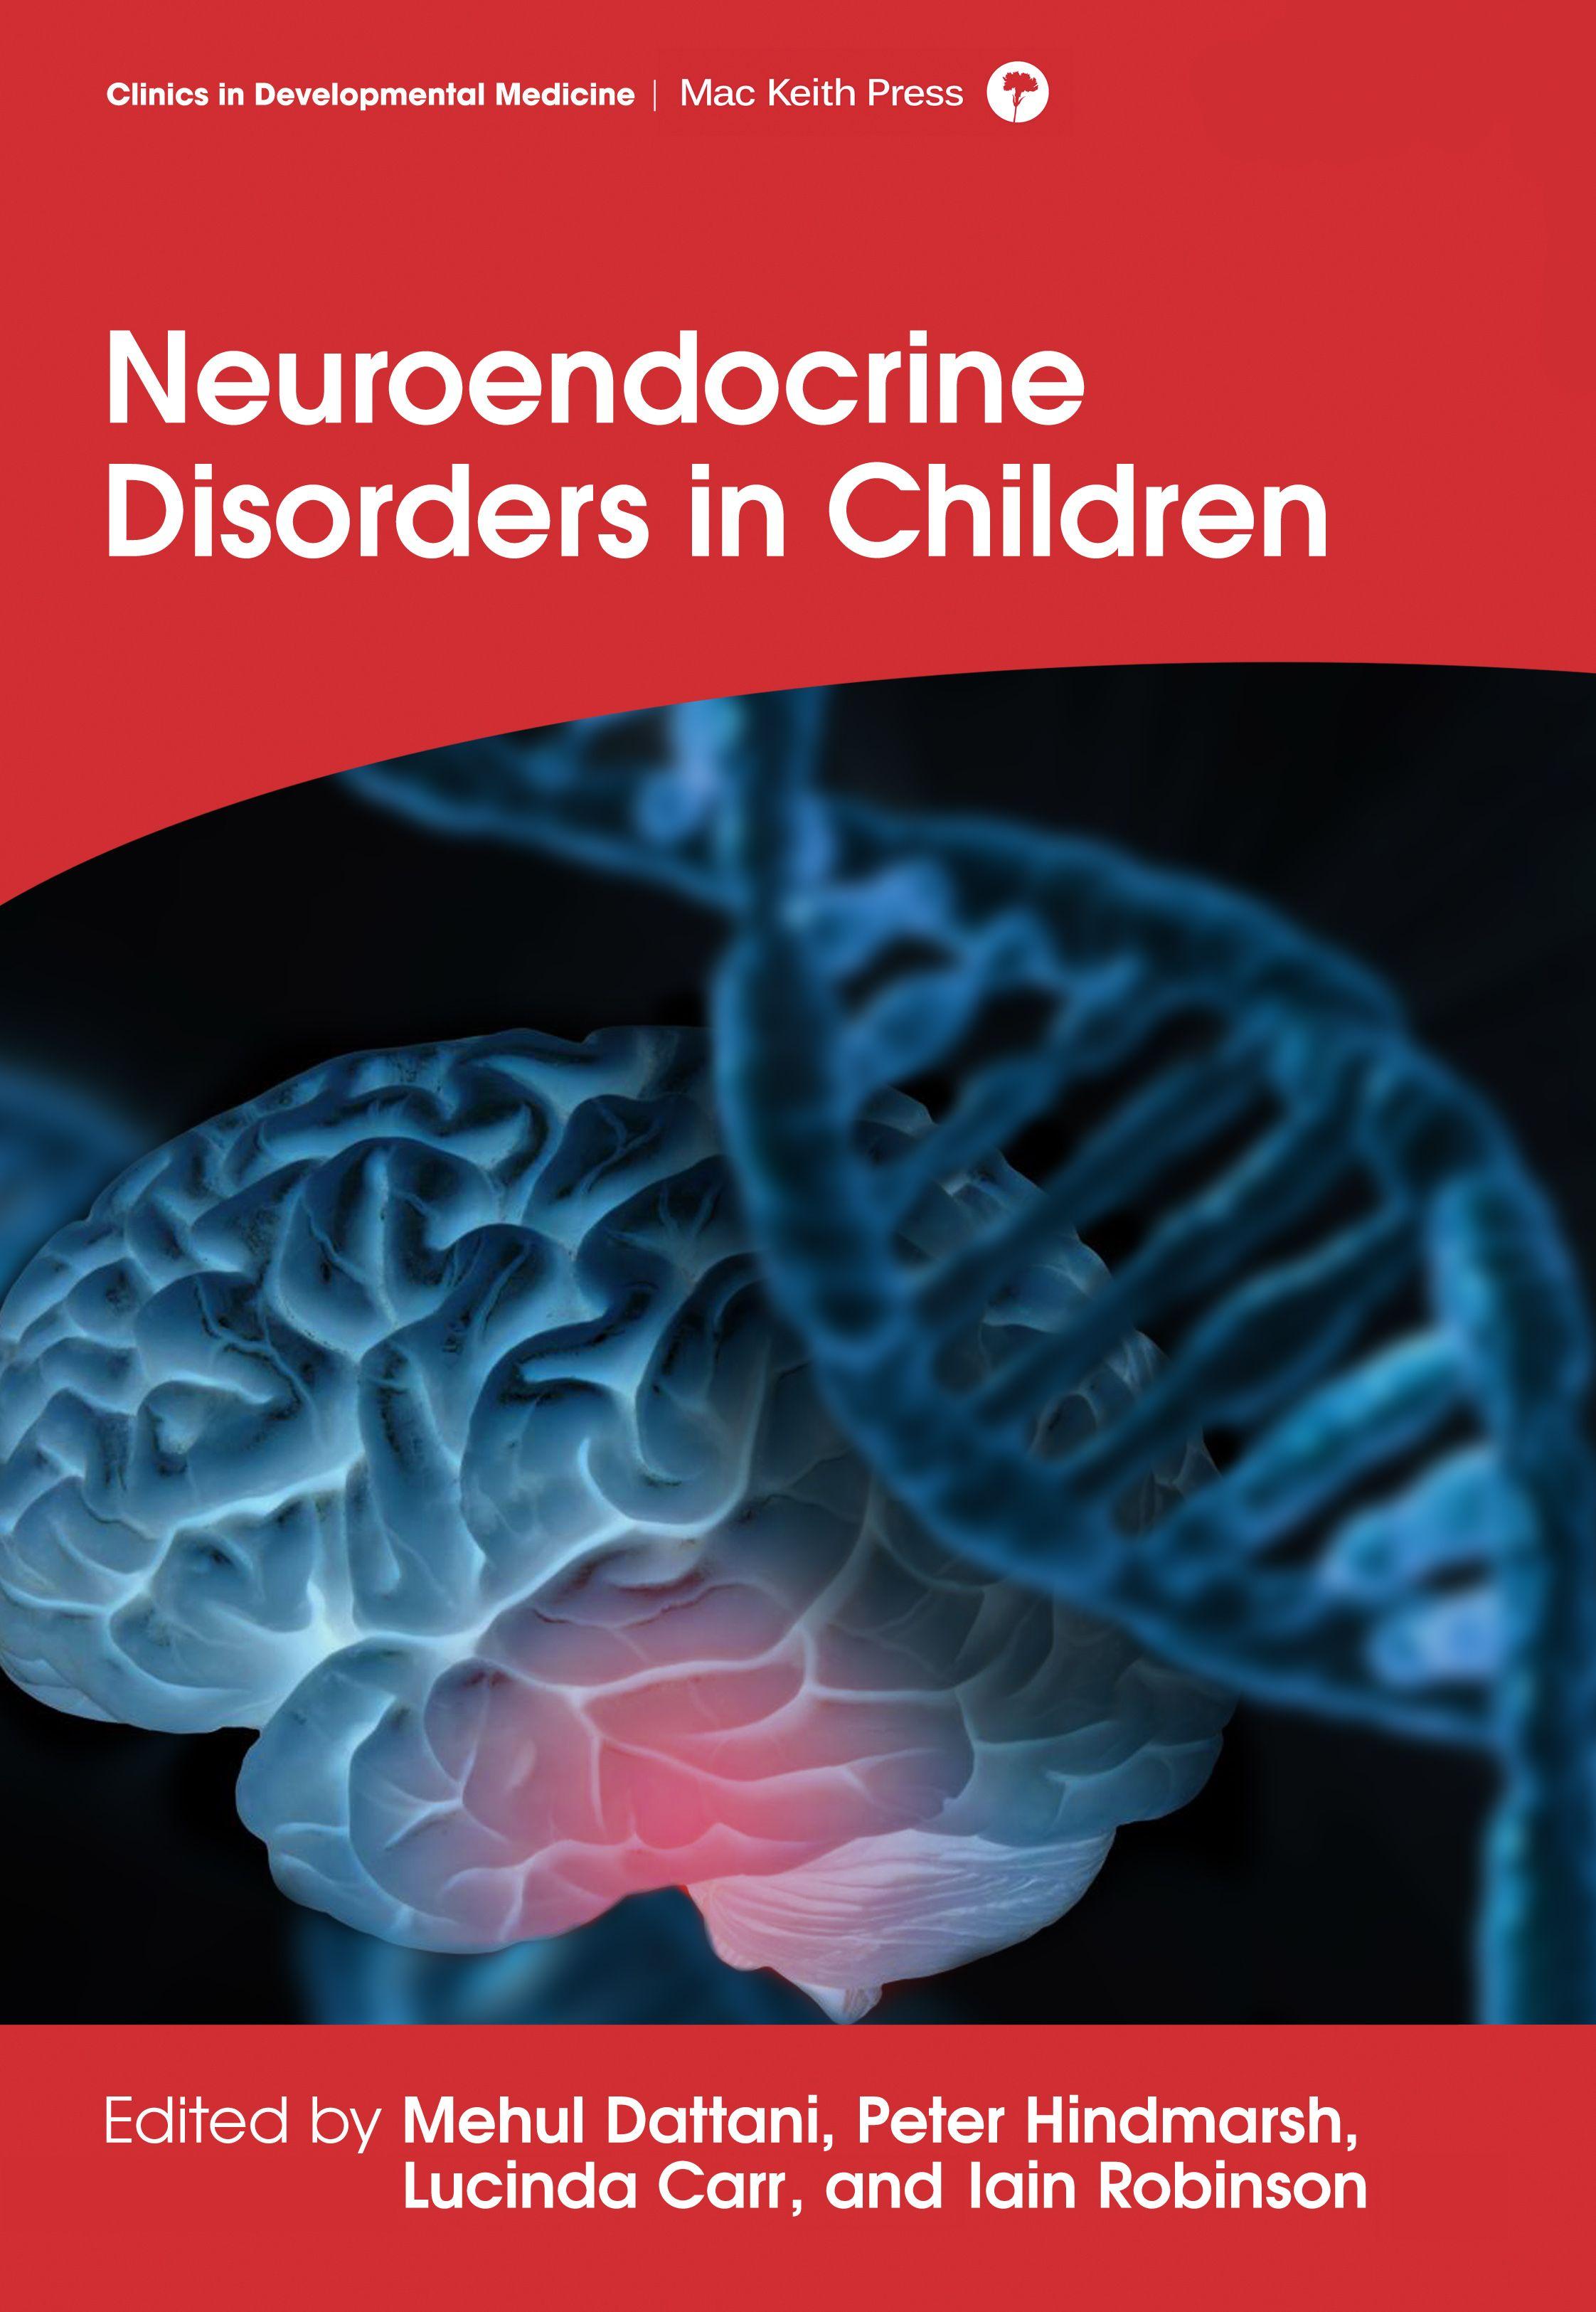 Mac Keith Press book Dattani Neuroendocrine Disorders